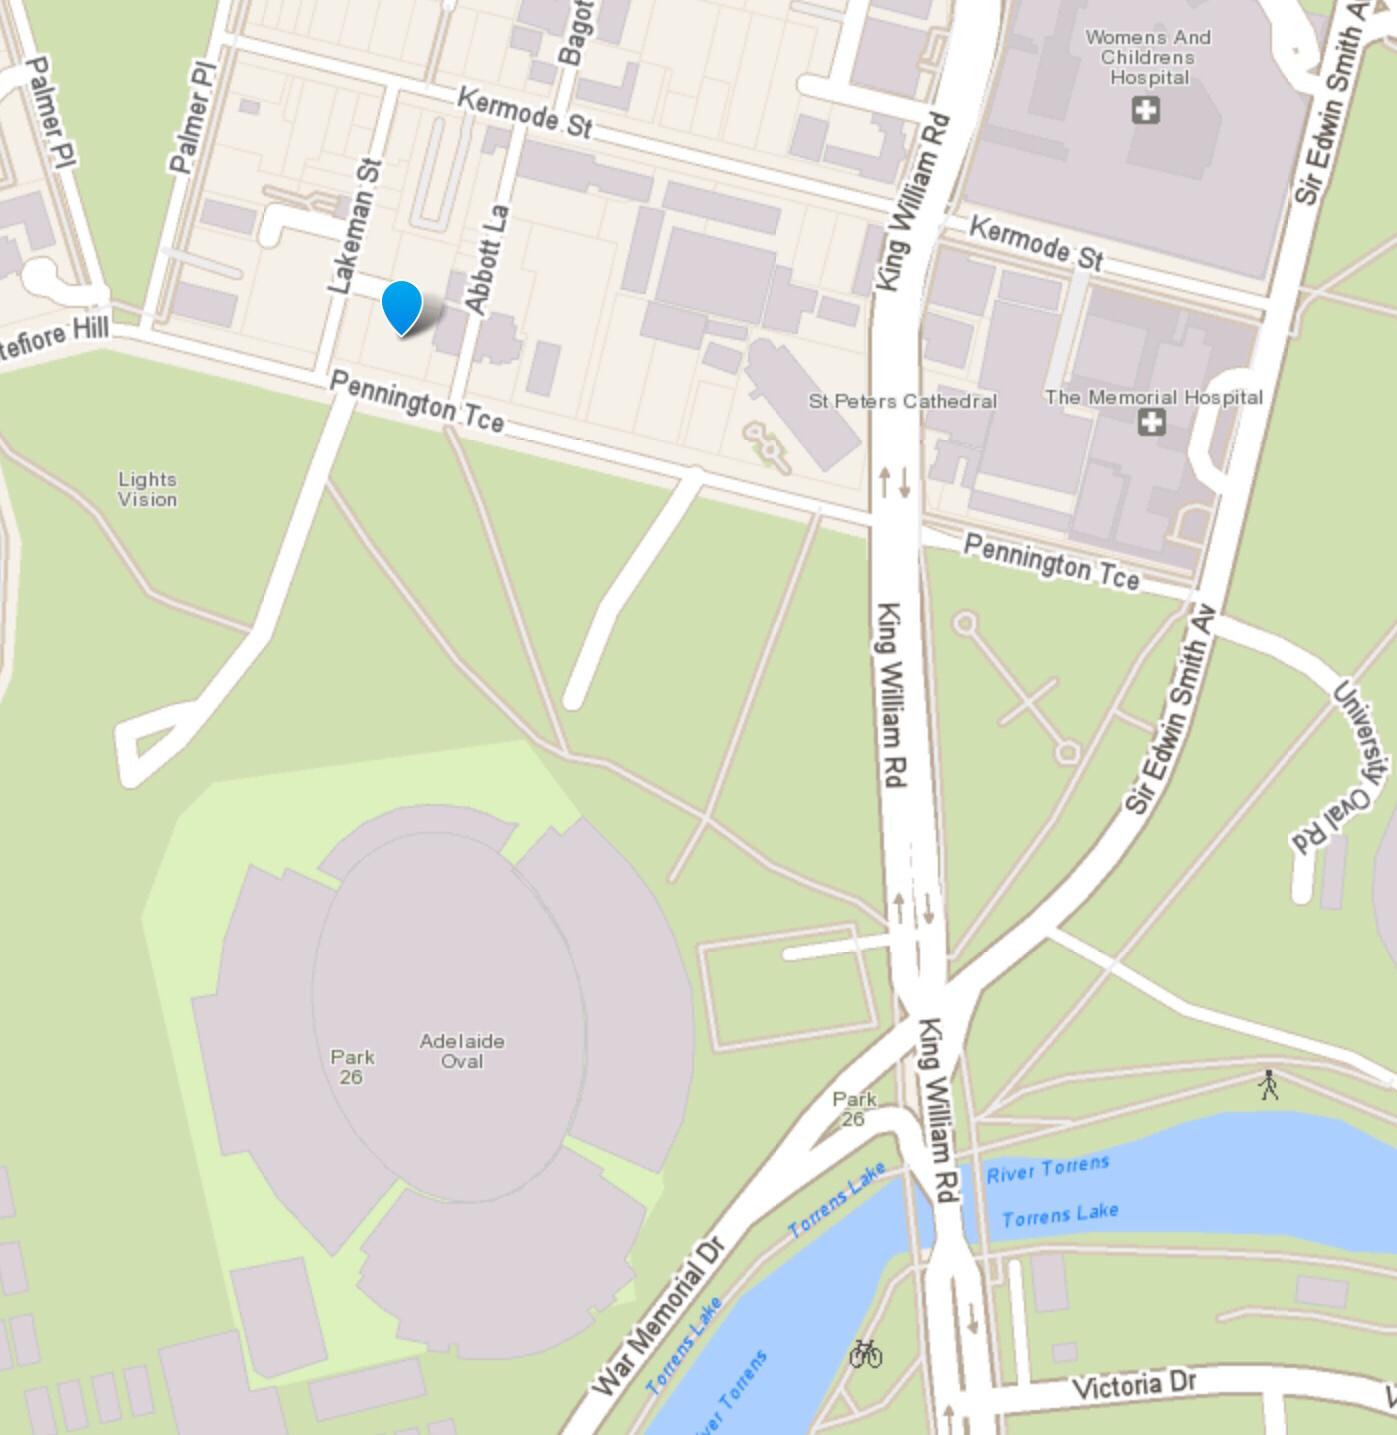 Map showing 64 Pennington Terrace